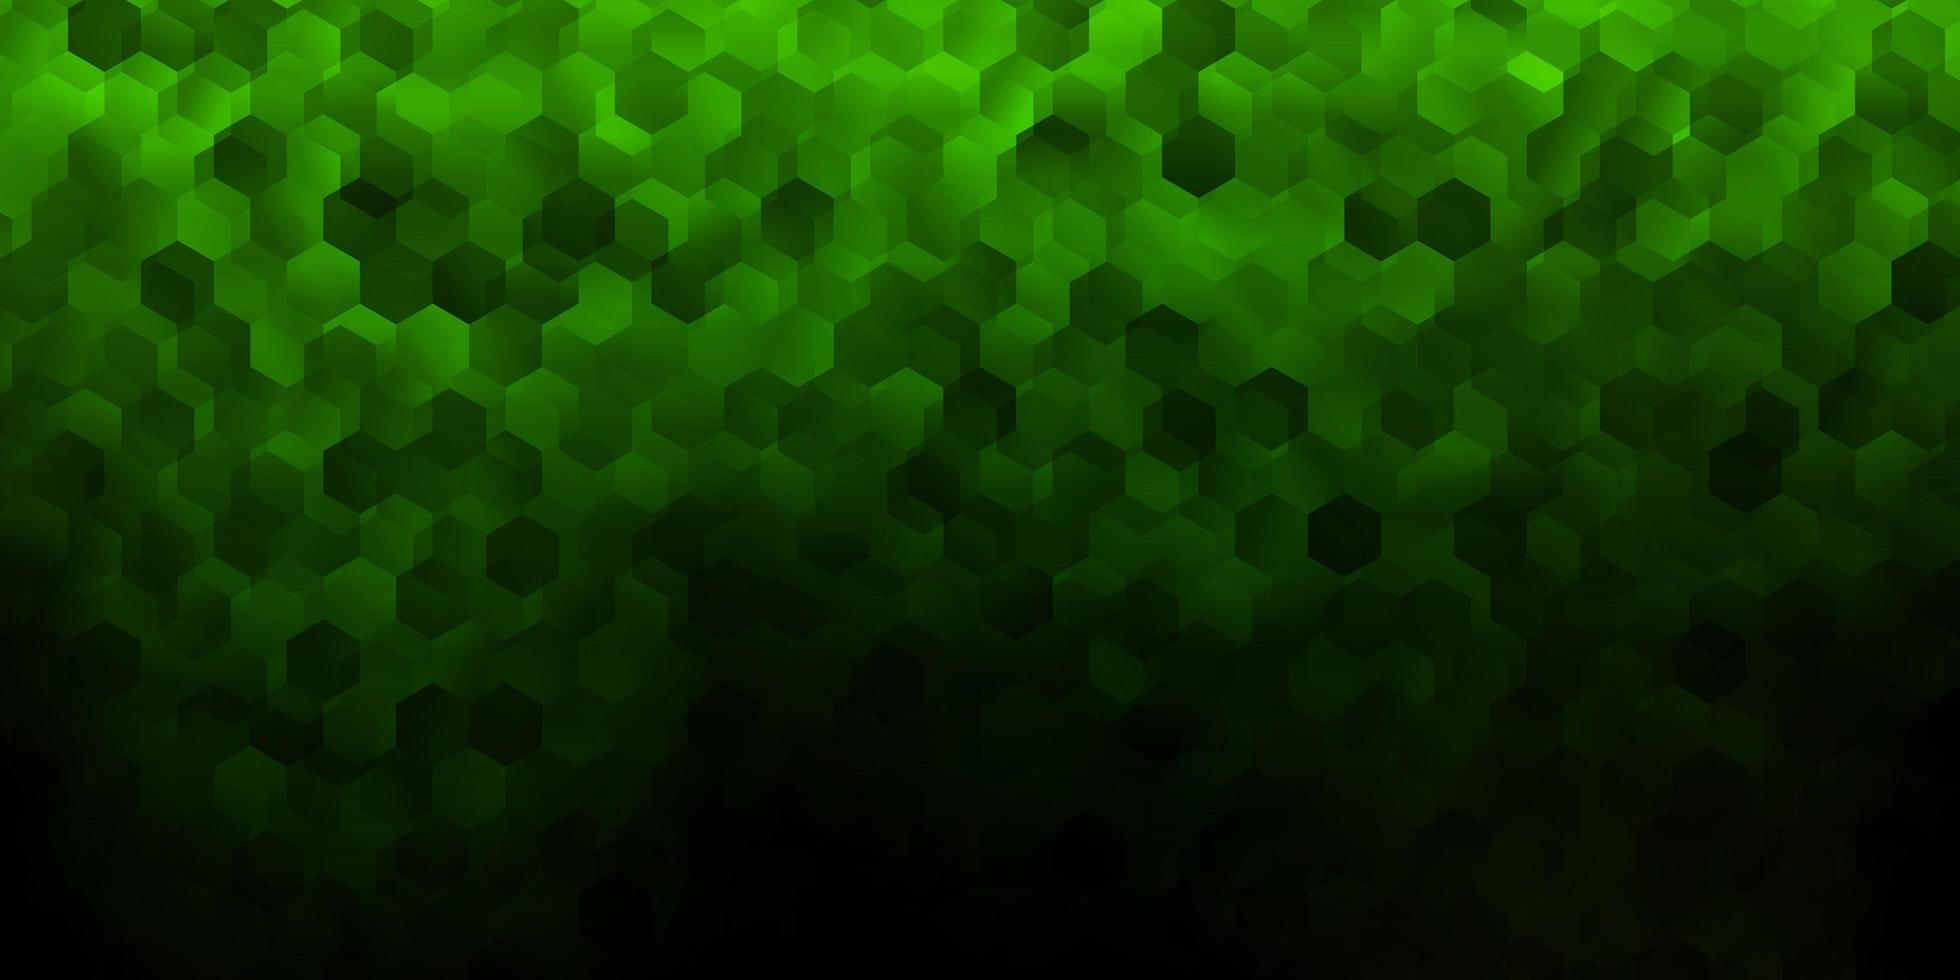 modelo de vetor verde escuro em estilo hexagonal.